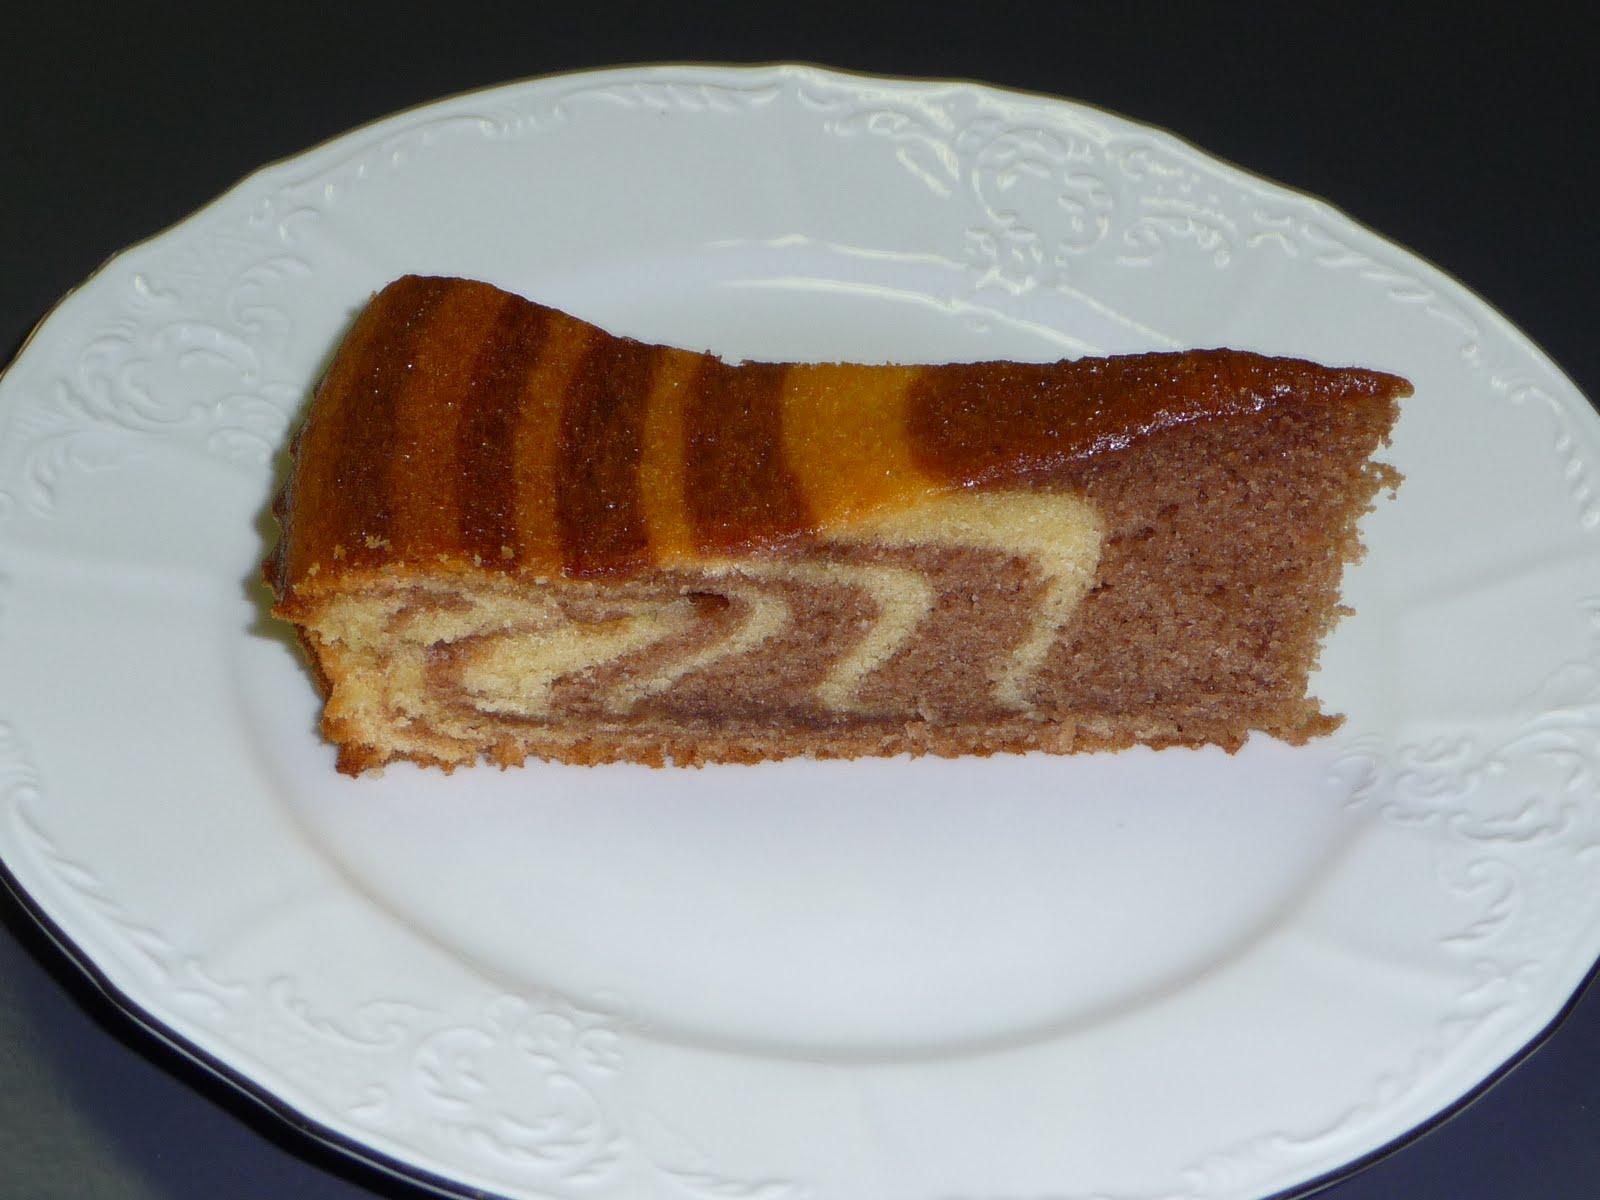 Le ricette di nadia torta zebrata di benedetta parodi for Ricette di benedetta parodi